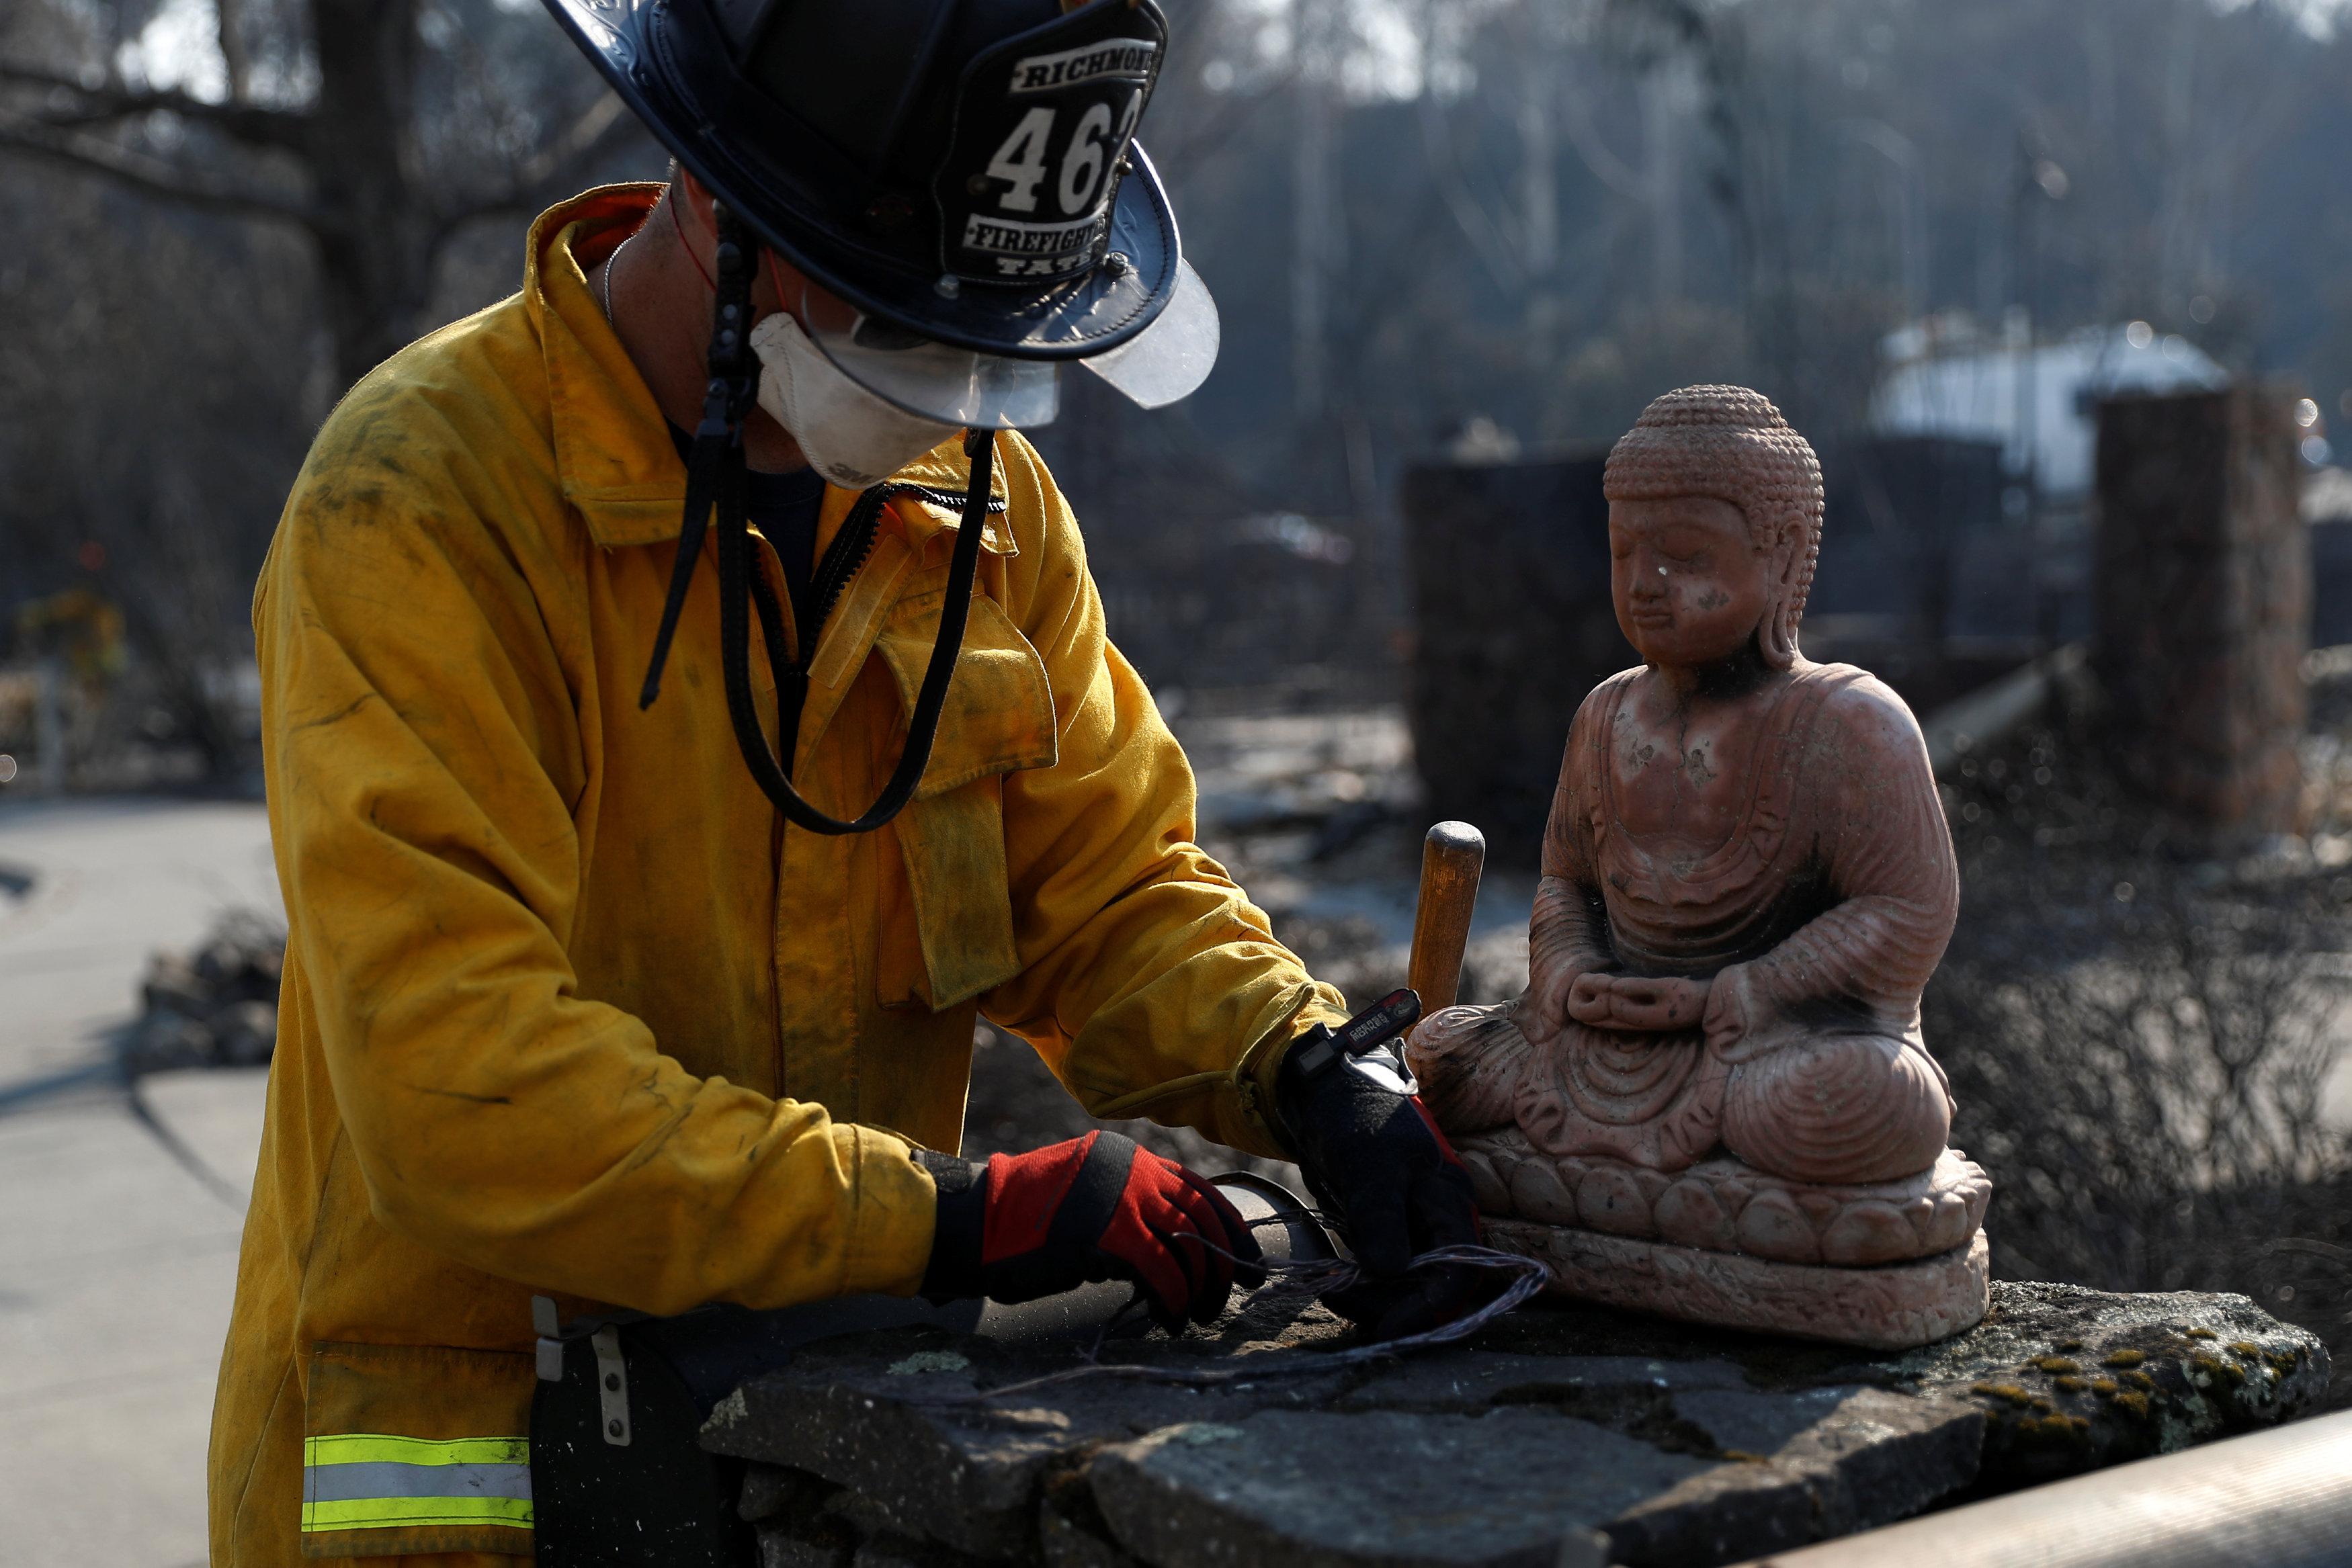 Richmond 救火員從住家救出一尊佛像。(美聯社)